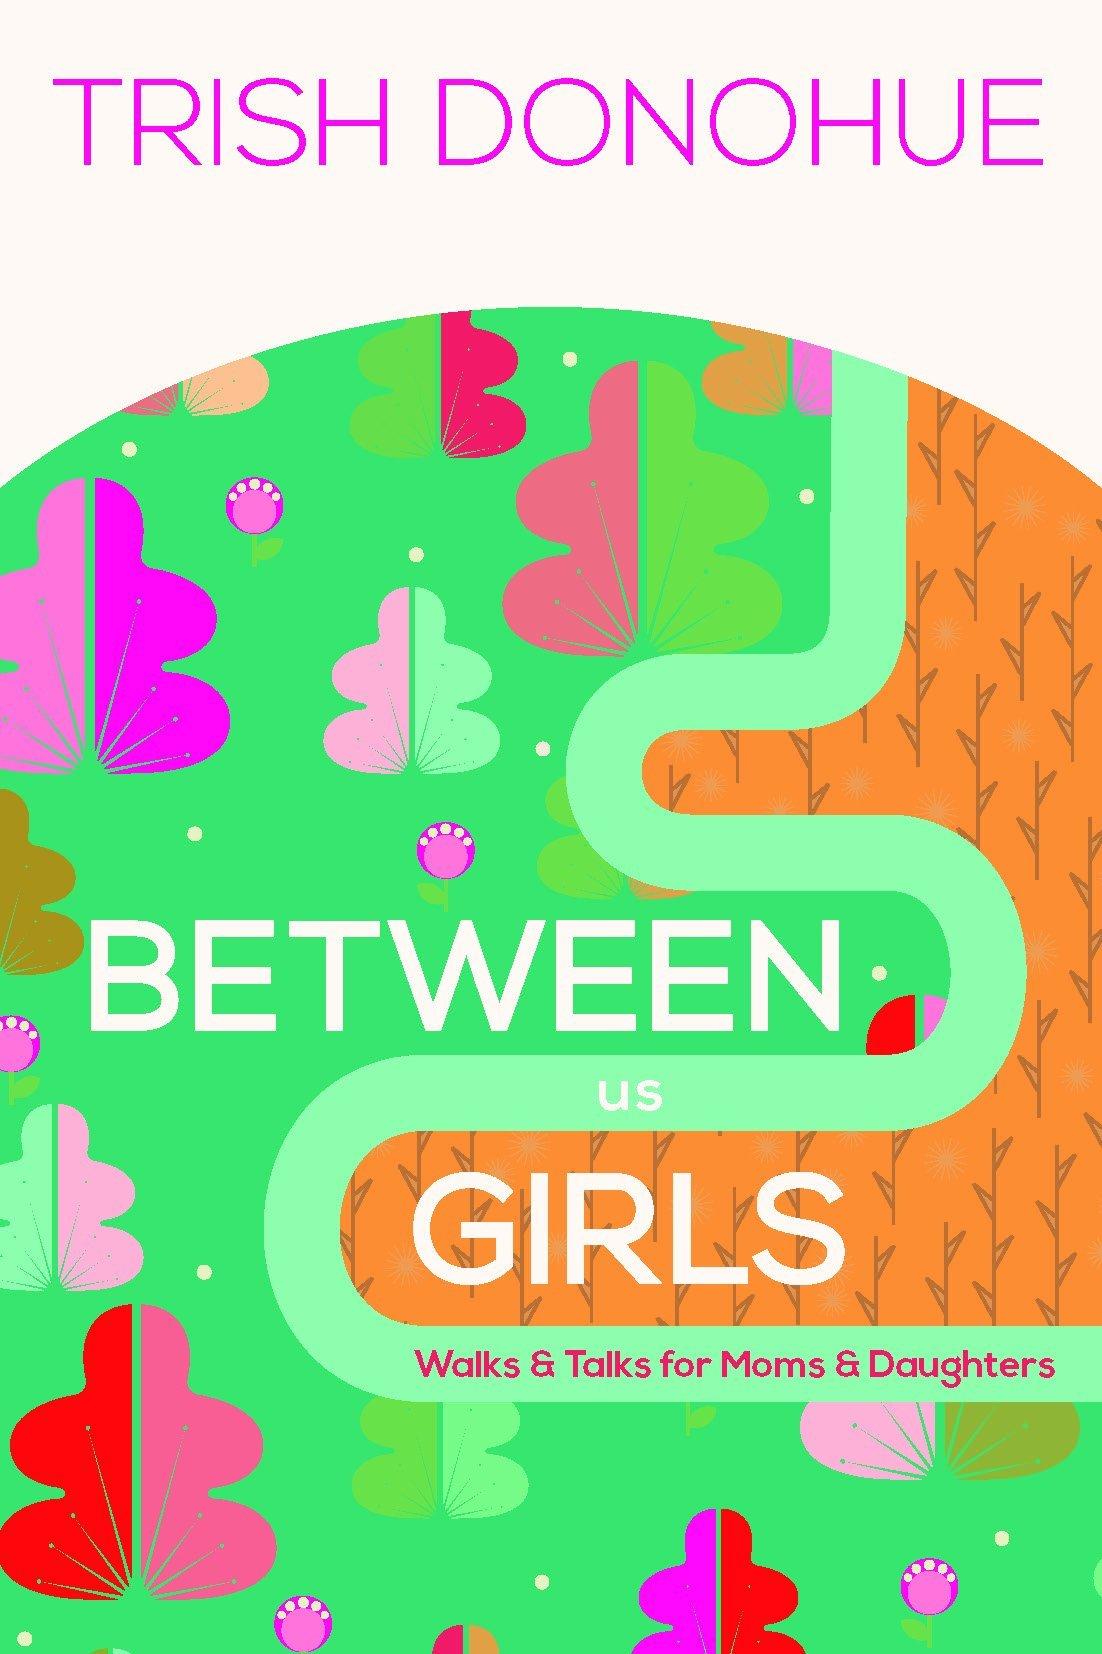 Between Us Girls Walks Daughters product image